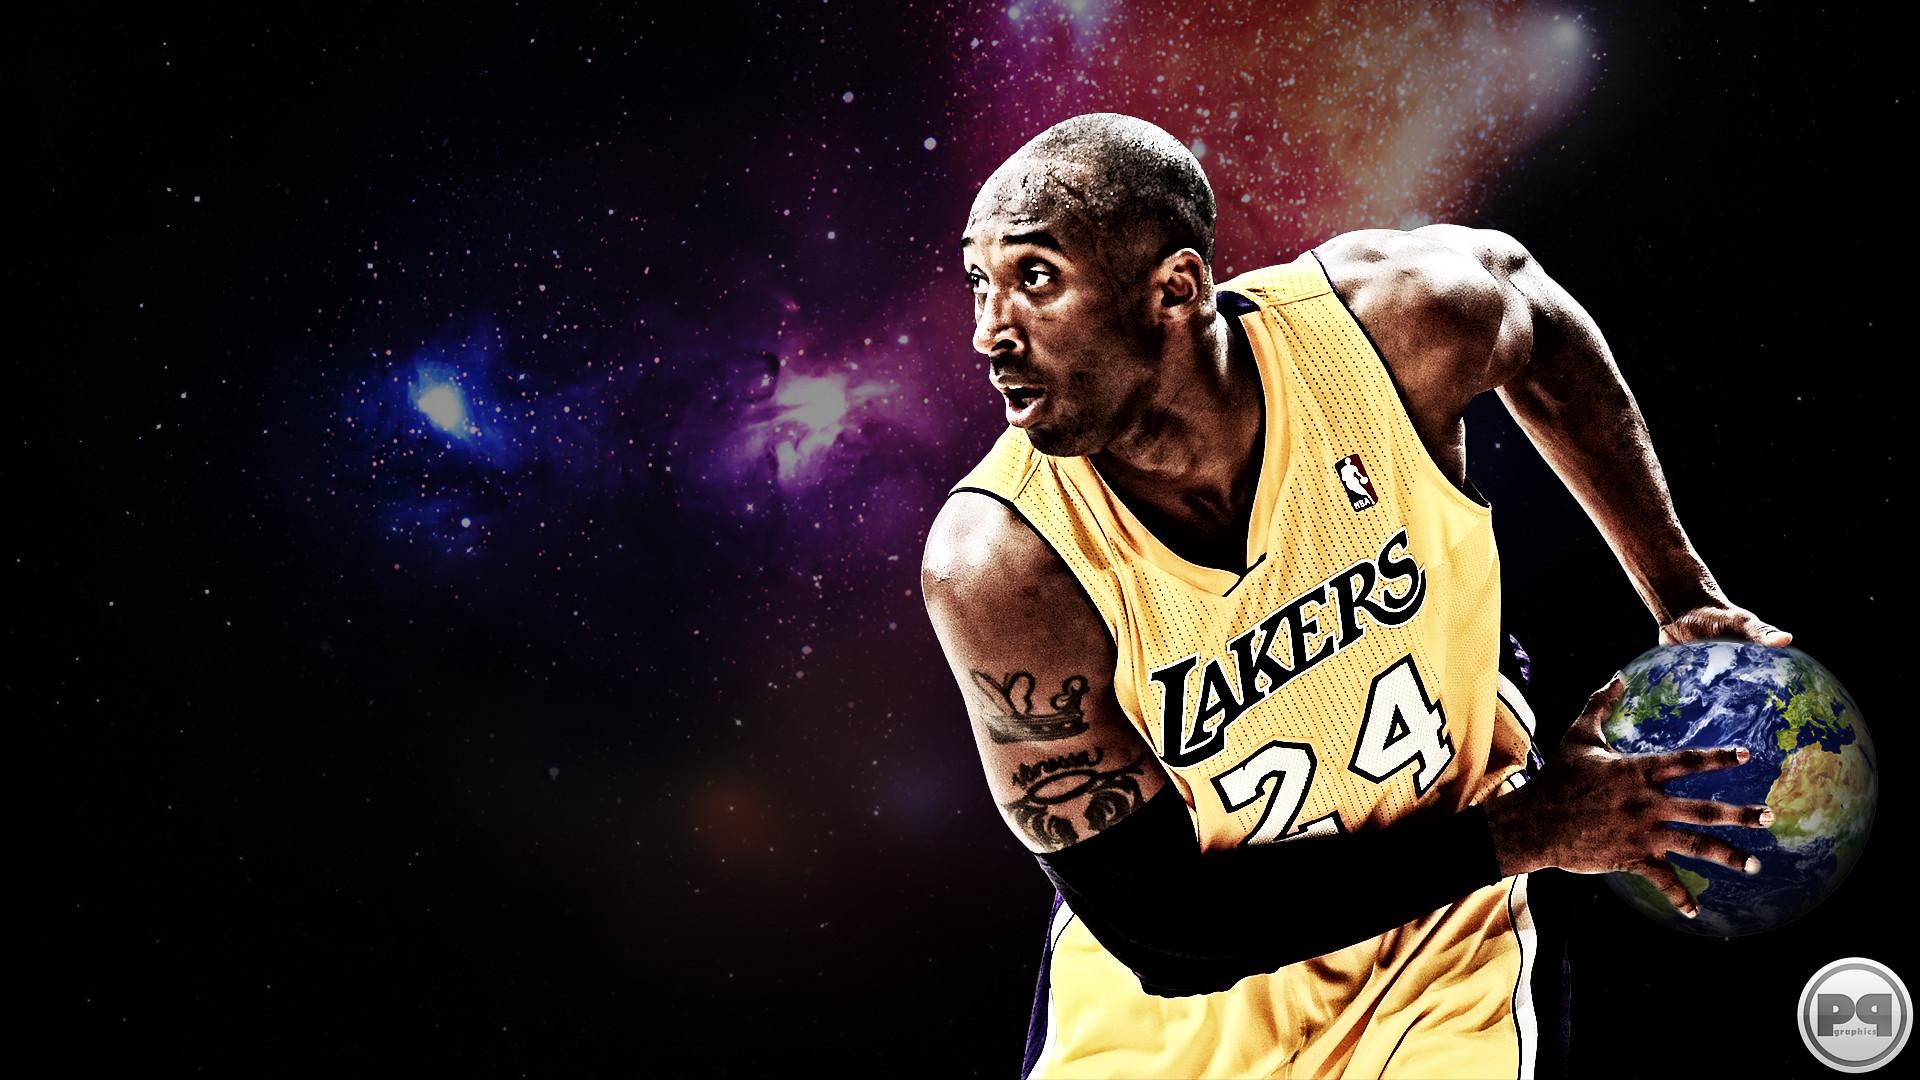 New NBA 2013 Kobe Bryant Los Angeles Lakers basketball wallpaper by  streetball fam member Pavan P